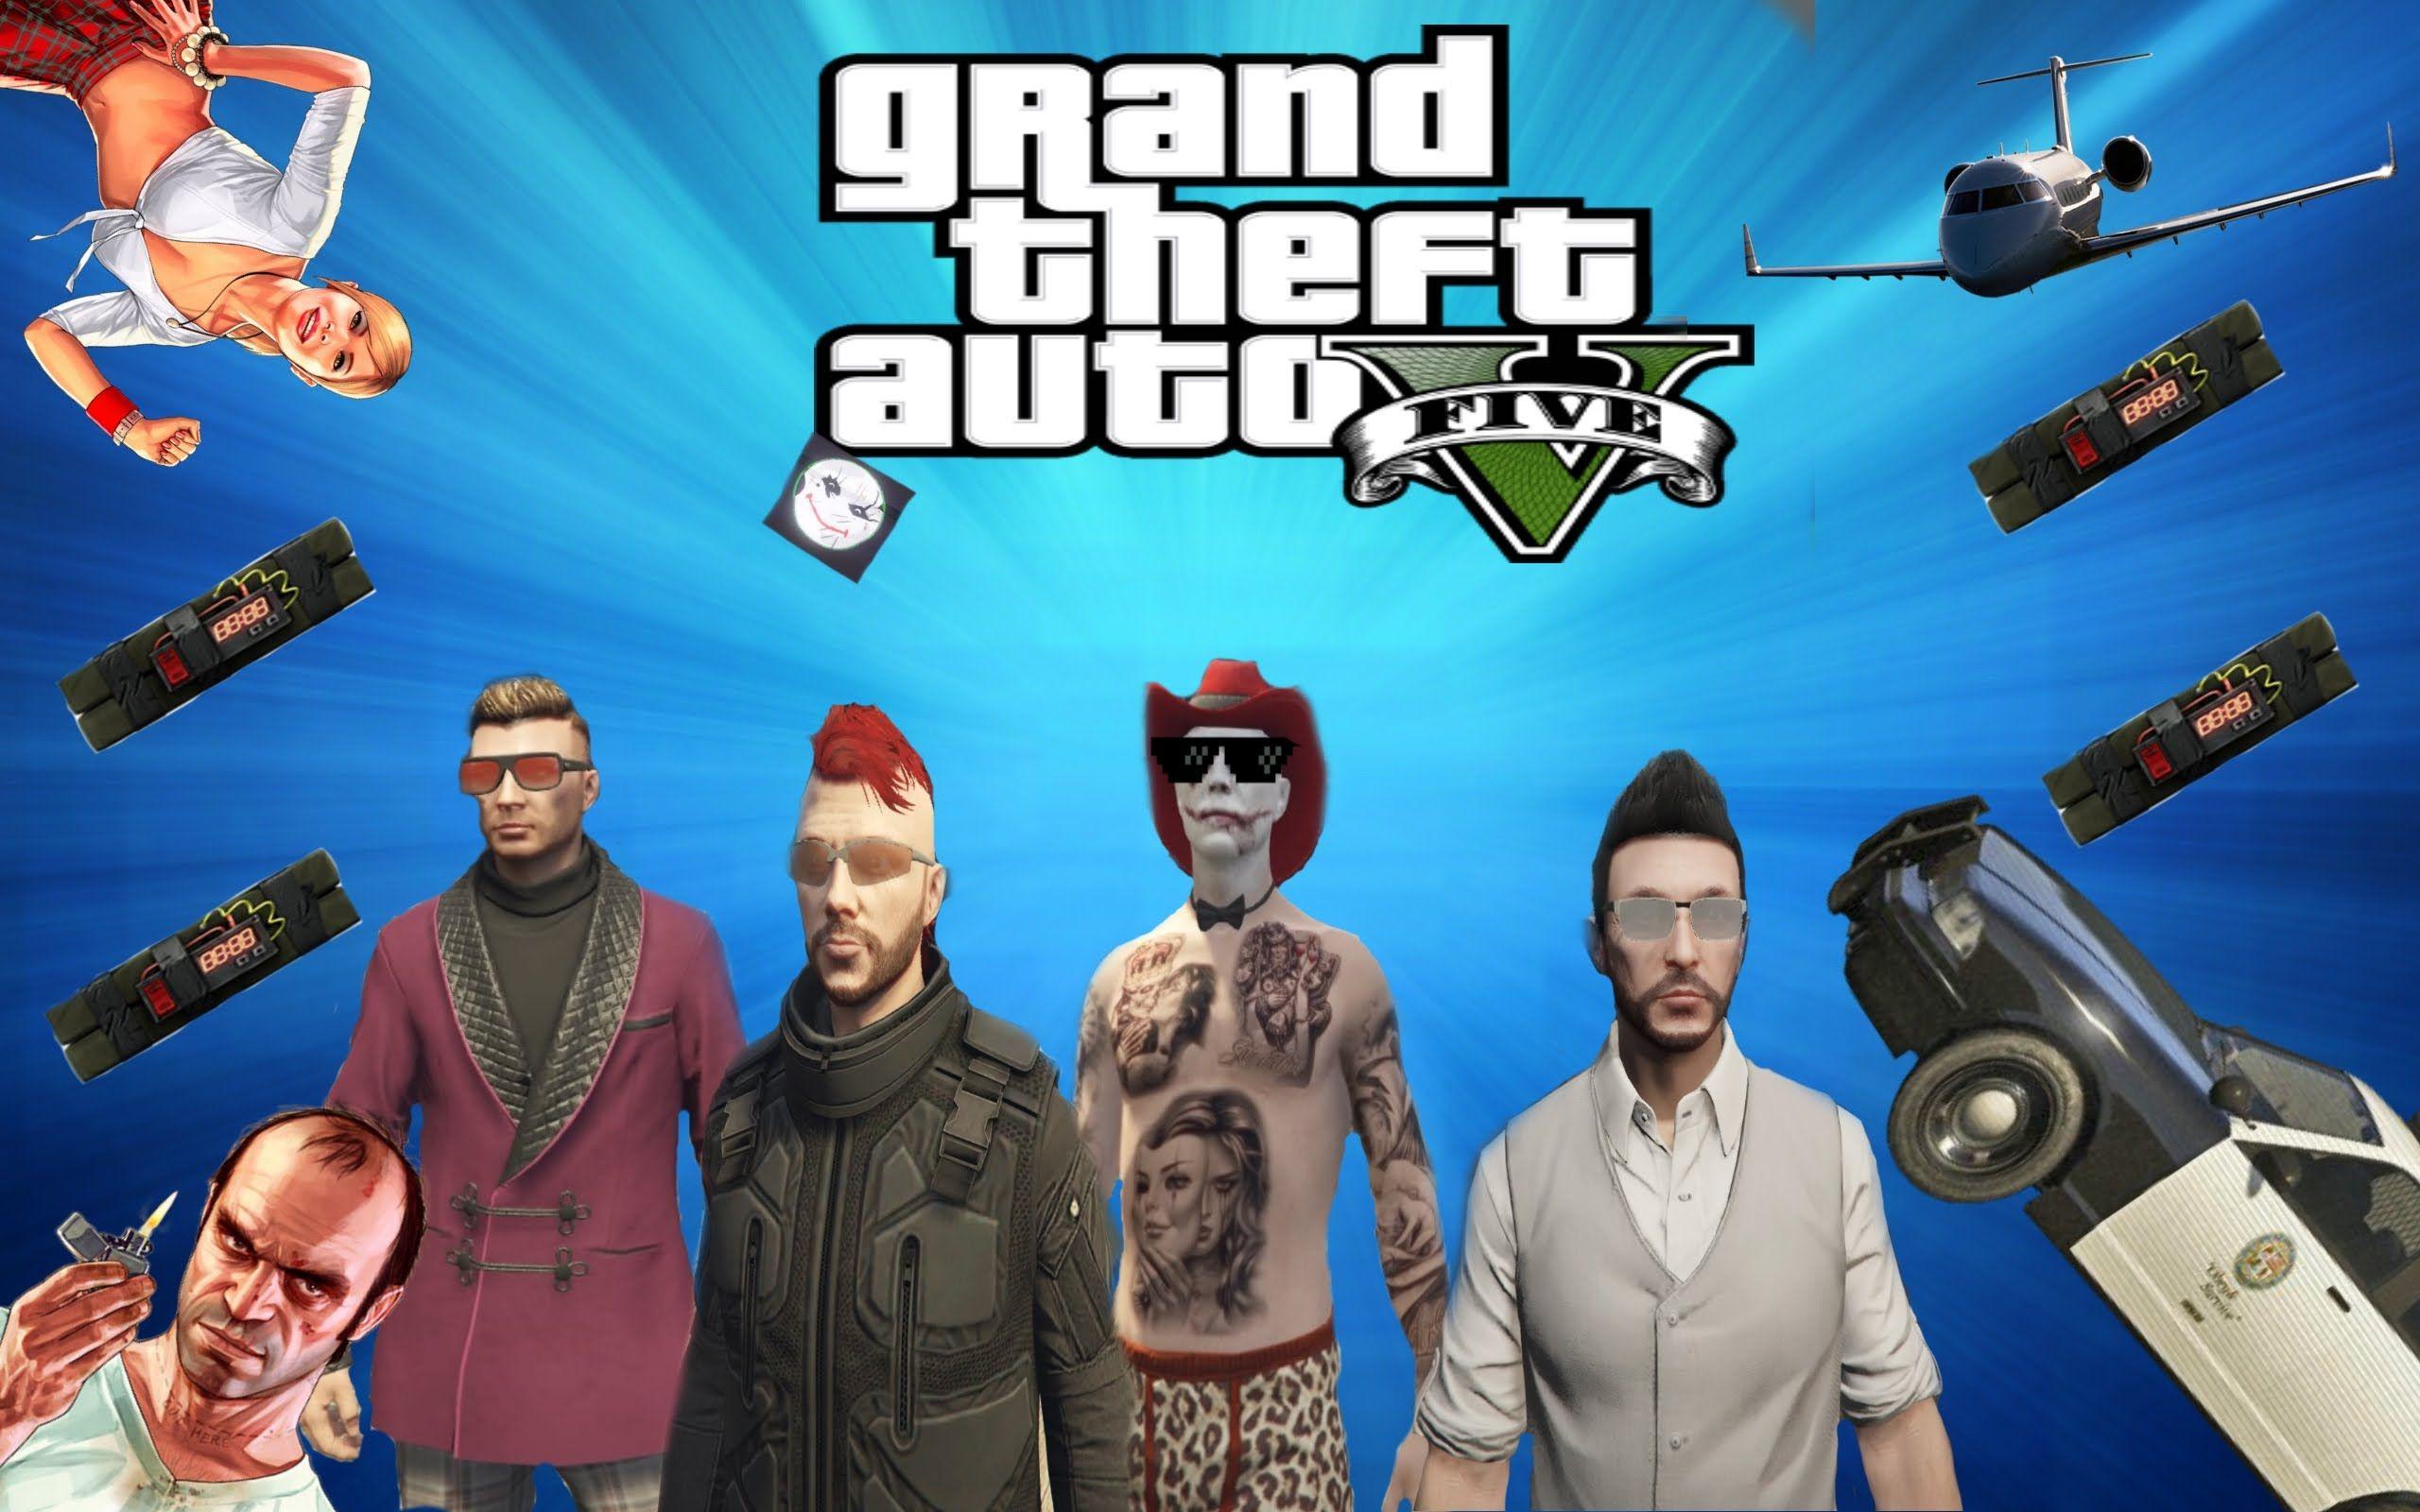 Funny GTA 5 Moments #GrandTheftAutoV #GTAV #GTA5 #GrandTheftAuto #GTA #GTAOnline #GrandTheftAuto5 #PS4 #games